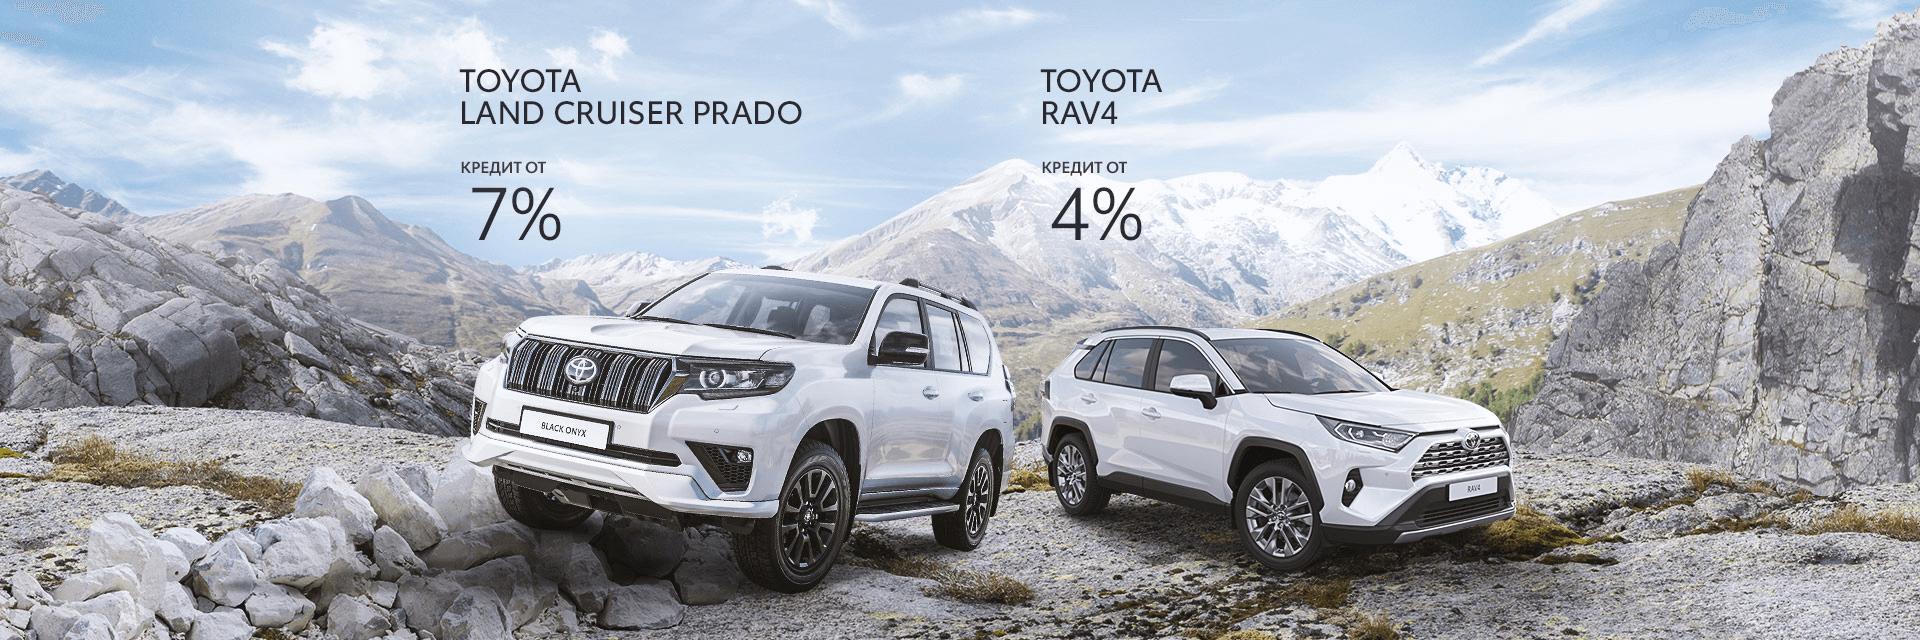 RAV4 & Prado - кредит